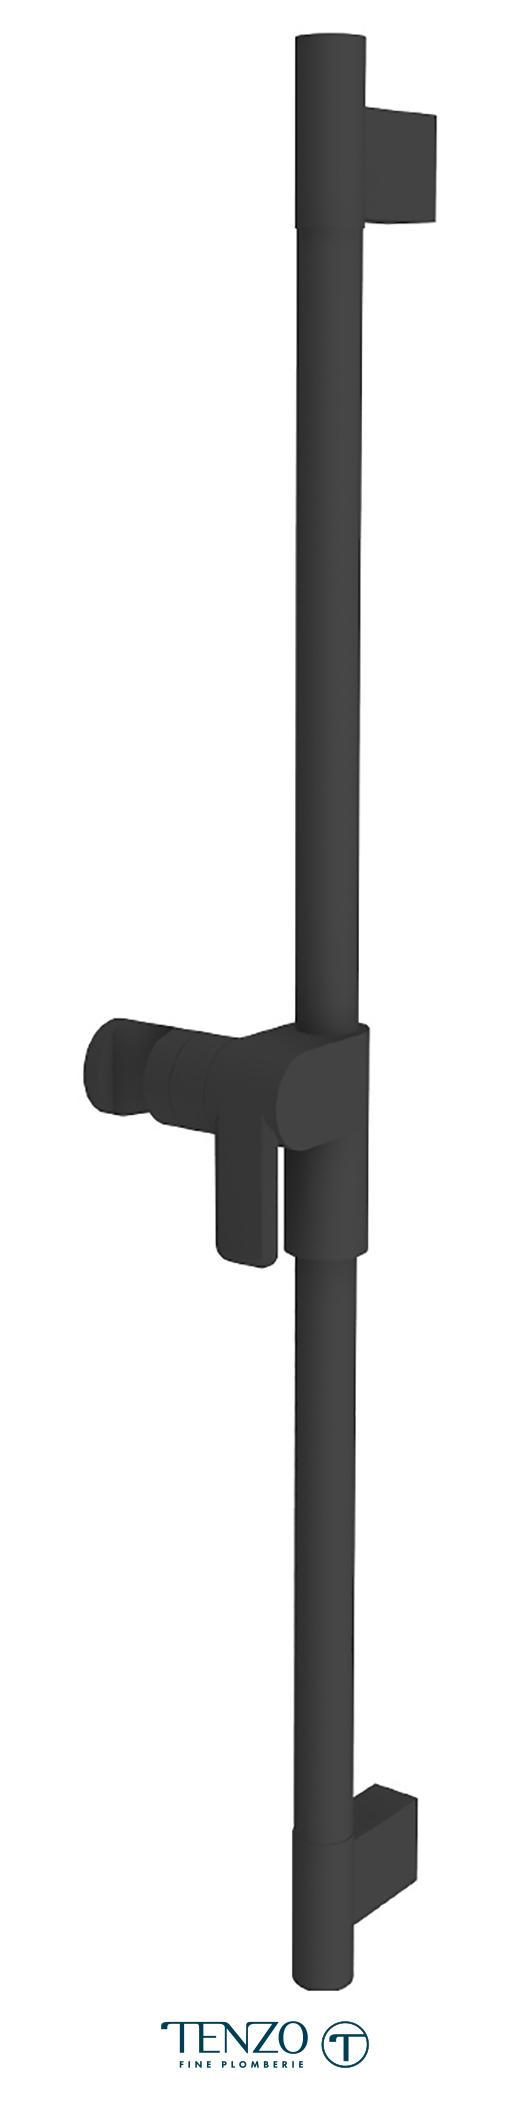 RD-35-MB - Sliding bar matte black